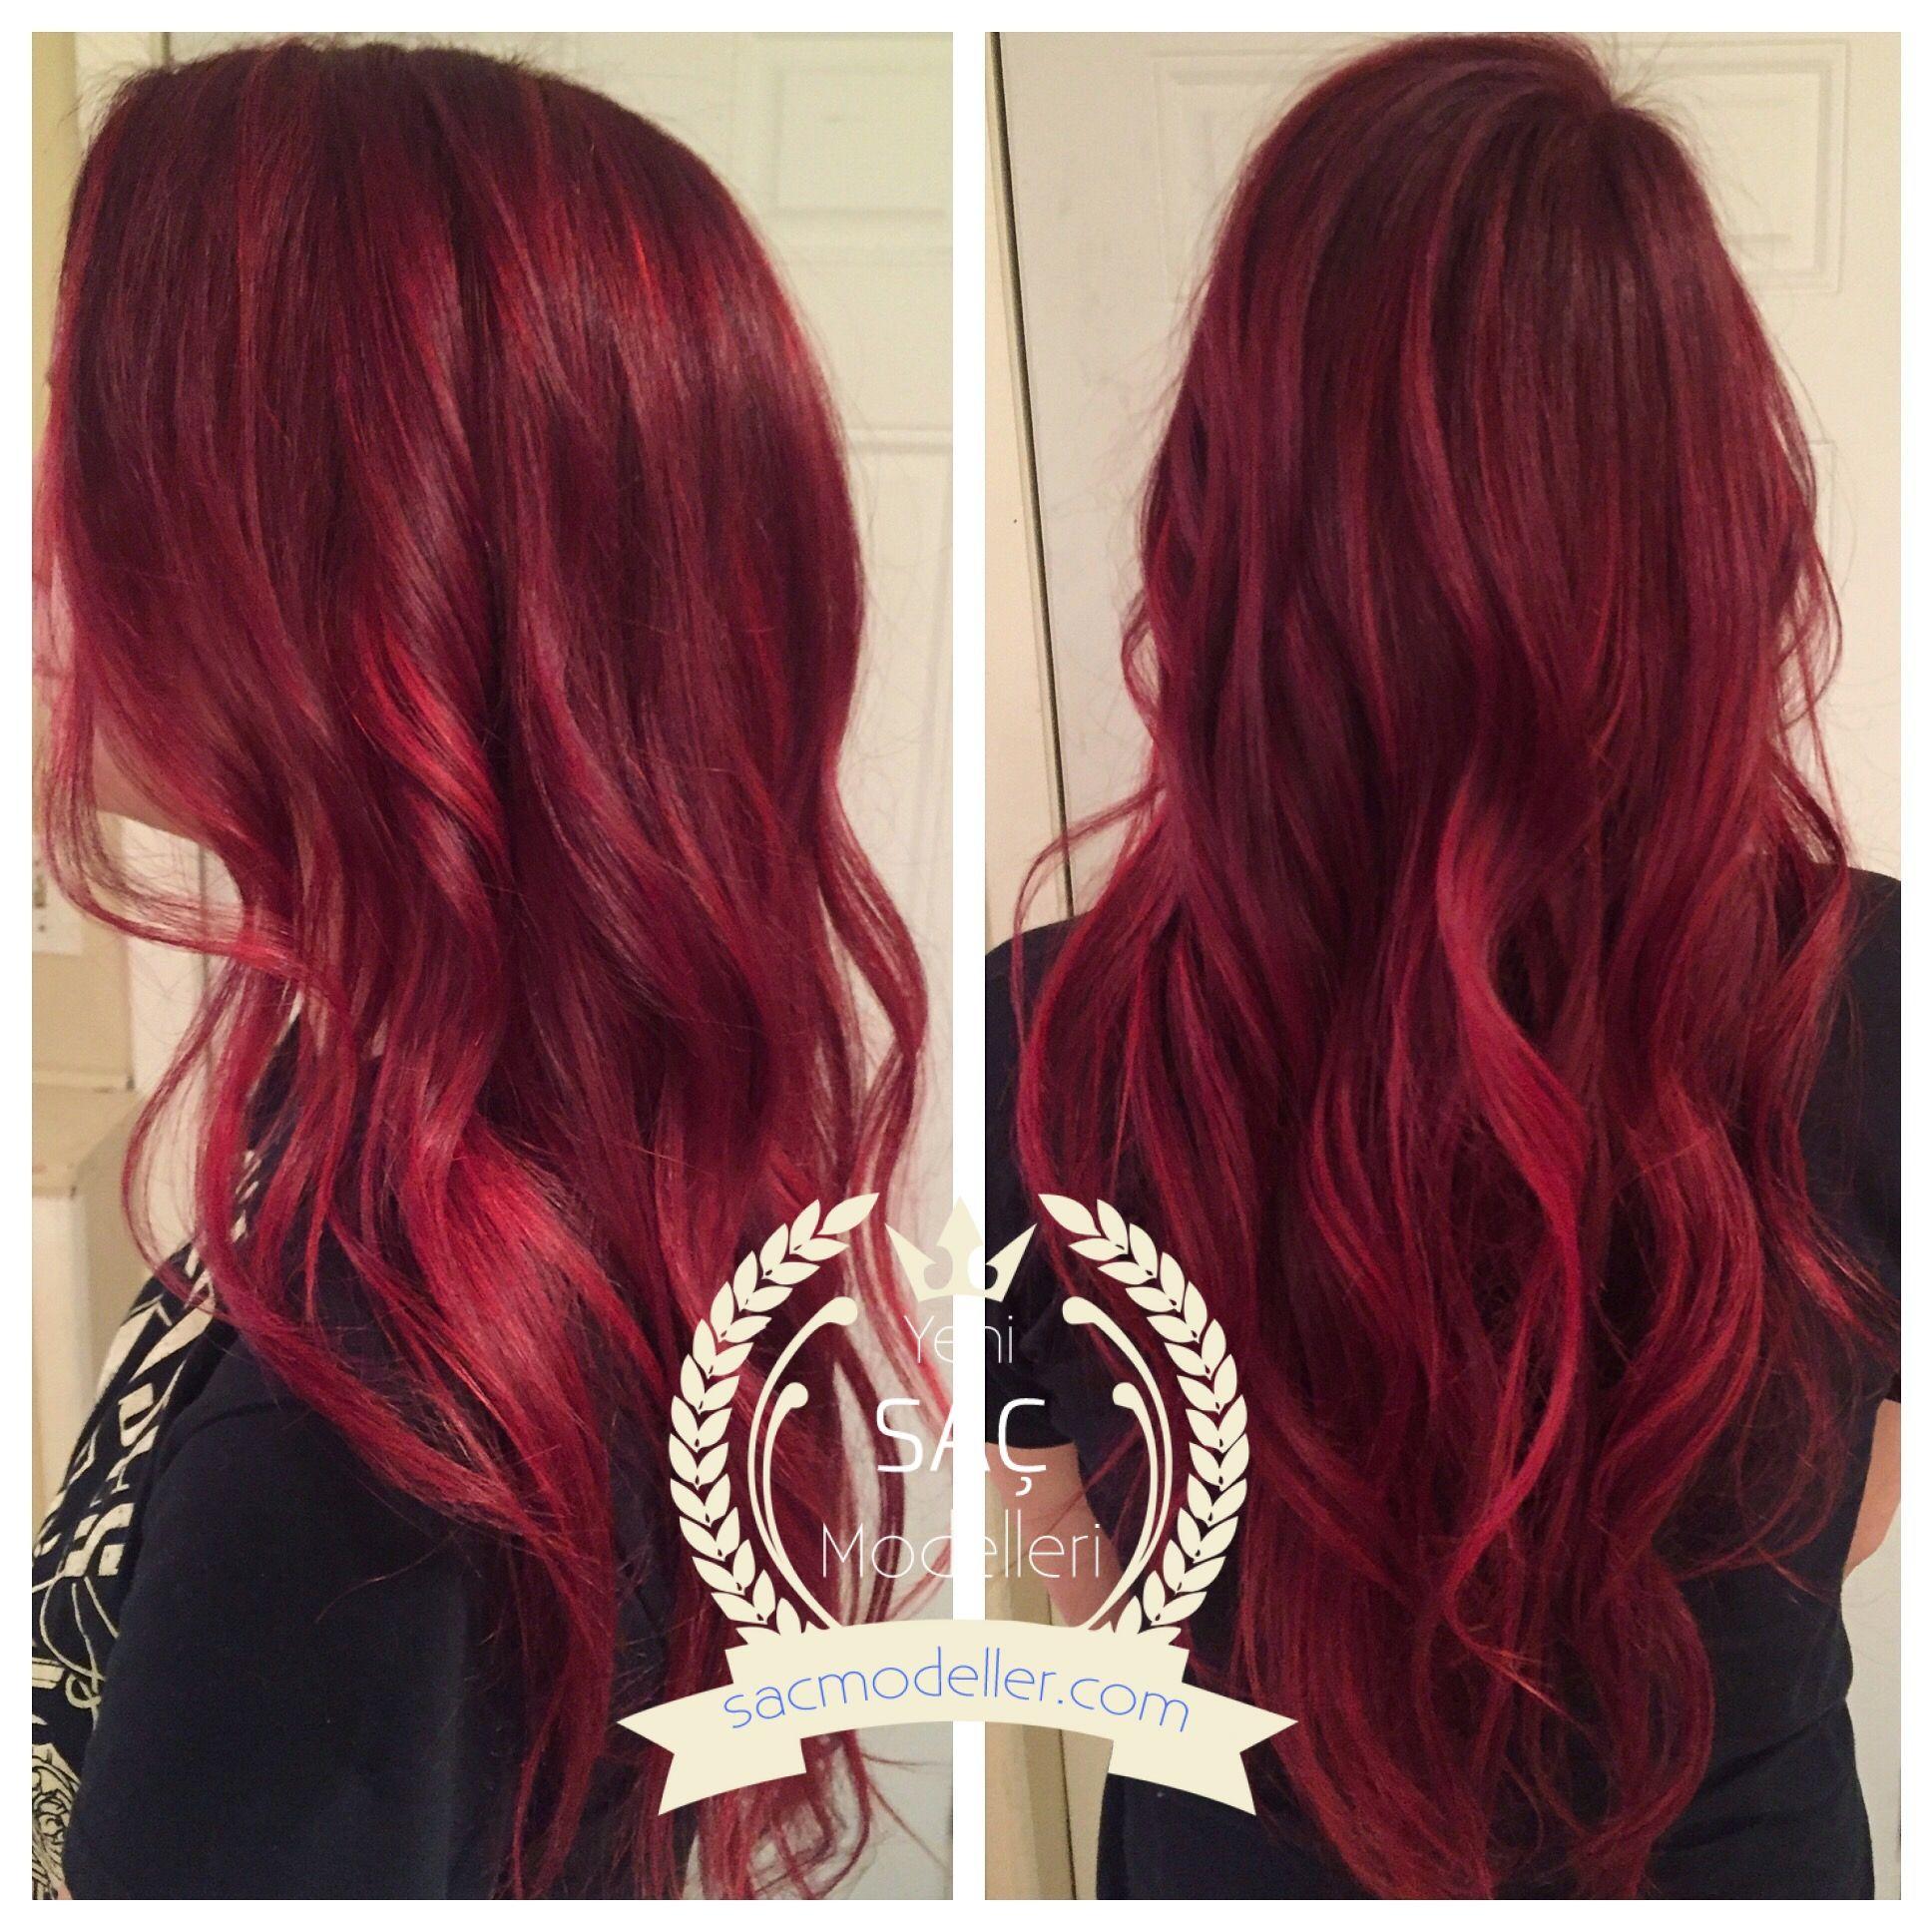 En Cok Begenilen Kizil Sac Rengi Modelleri Gorgeous Hair Hair